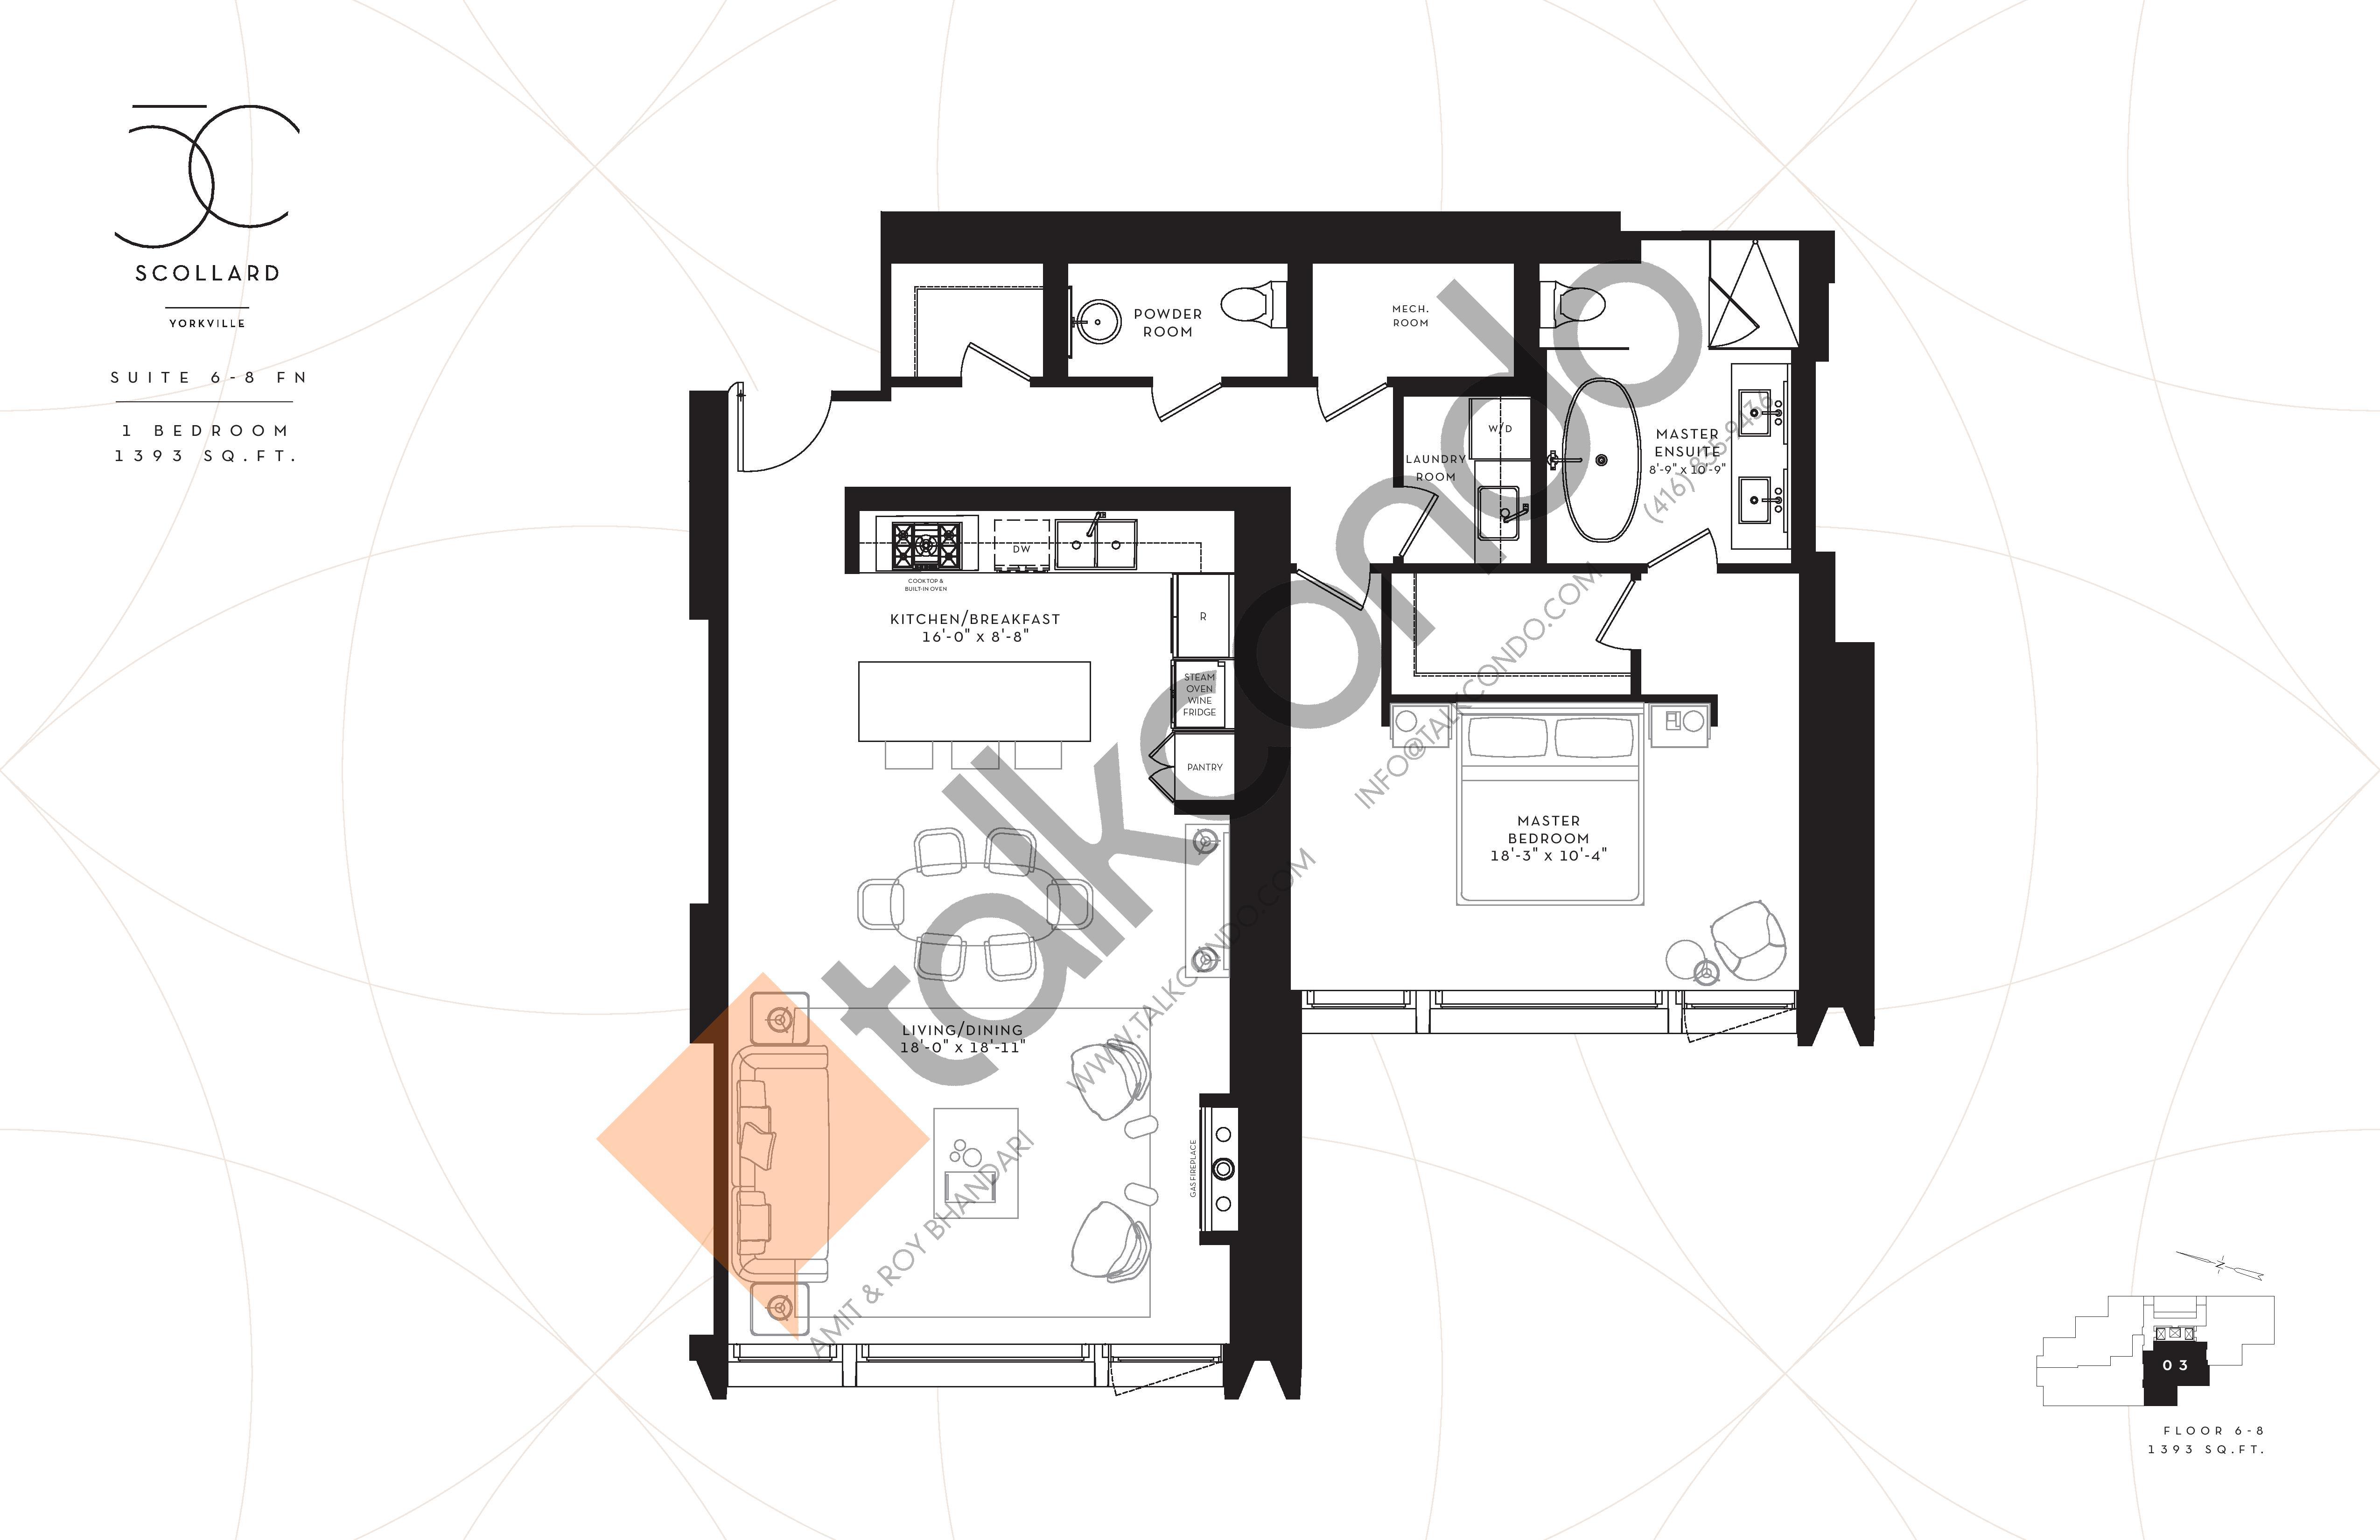 Suite 6-8FN Floor Plan at Fifty Scollard Condos - 1393 sq.ft